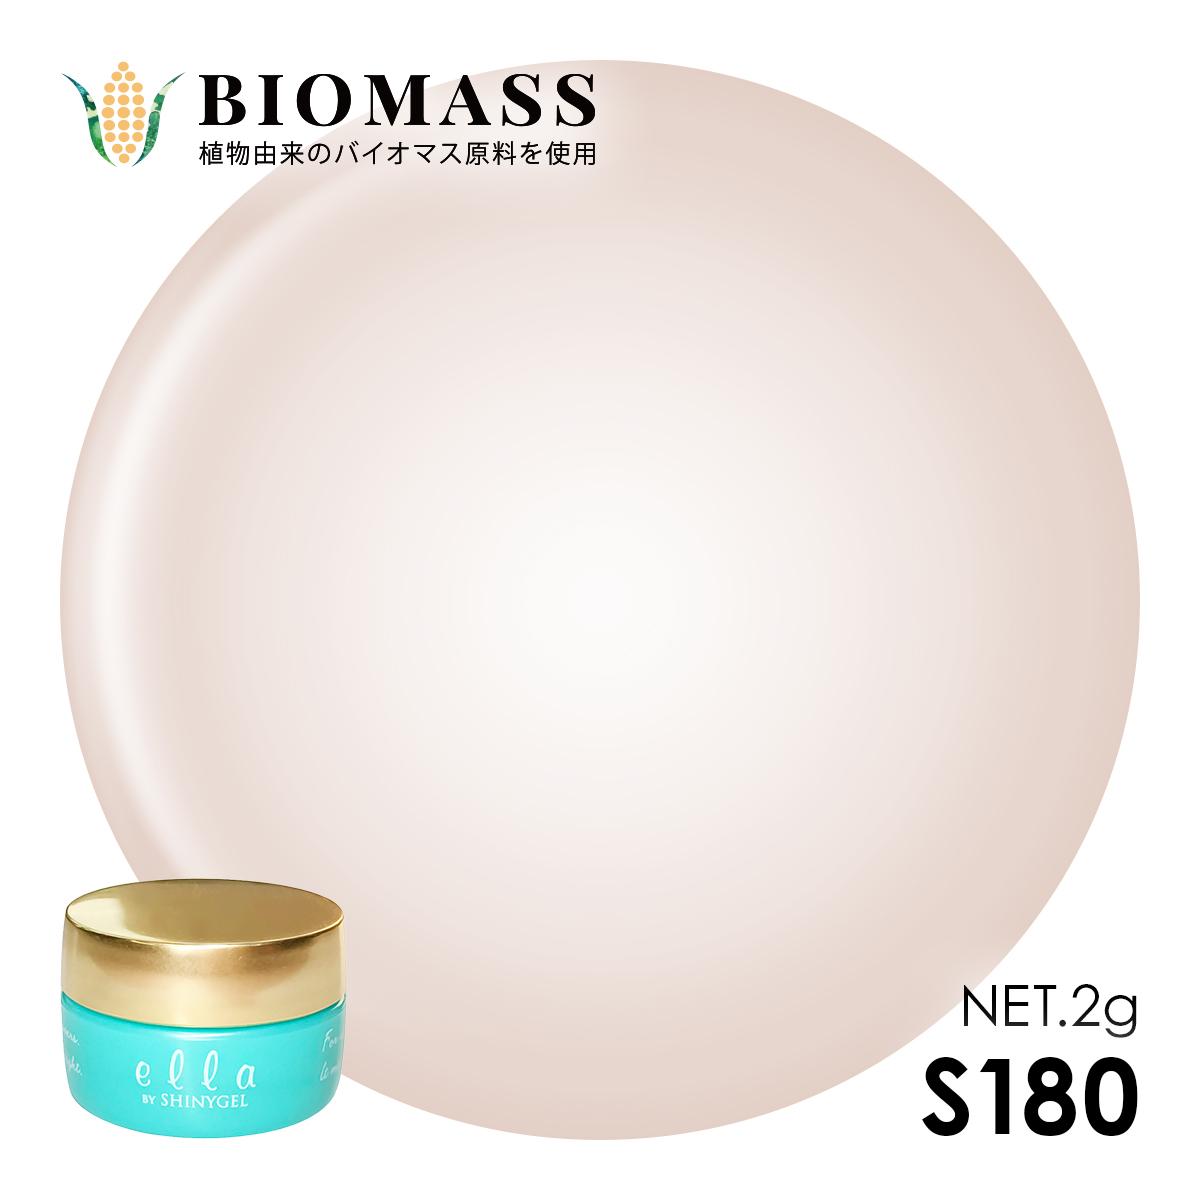 ella BY SHINYGEL:カラージェル S180 ウォーターシナモン(エラバイシャイニージェル) [UV/LED対応○] $